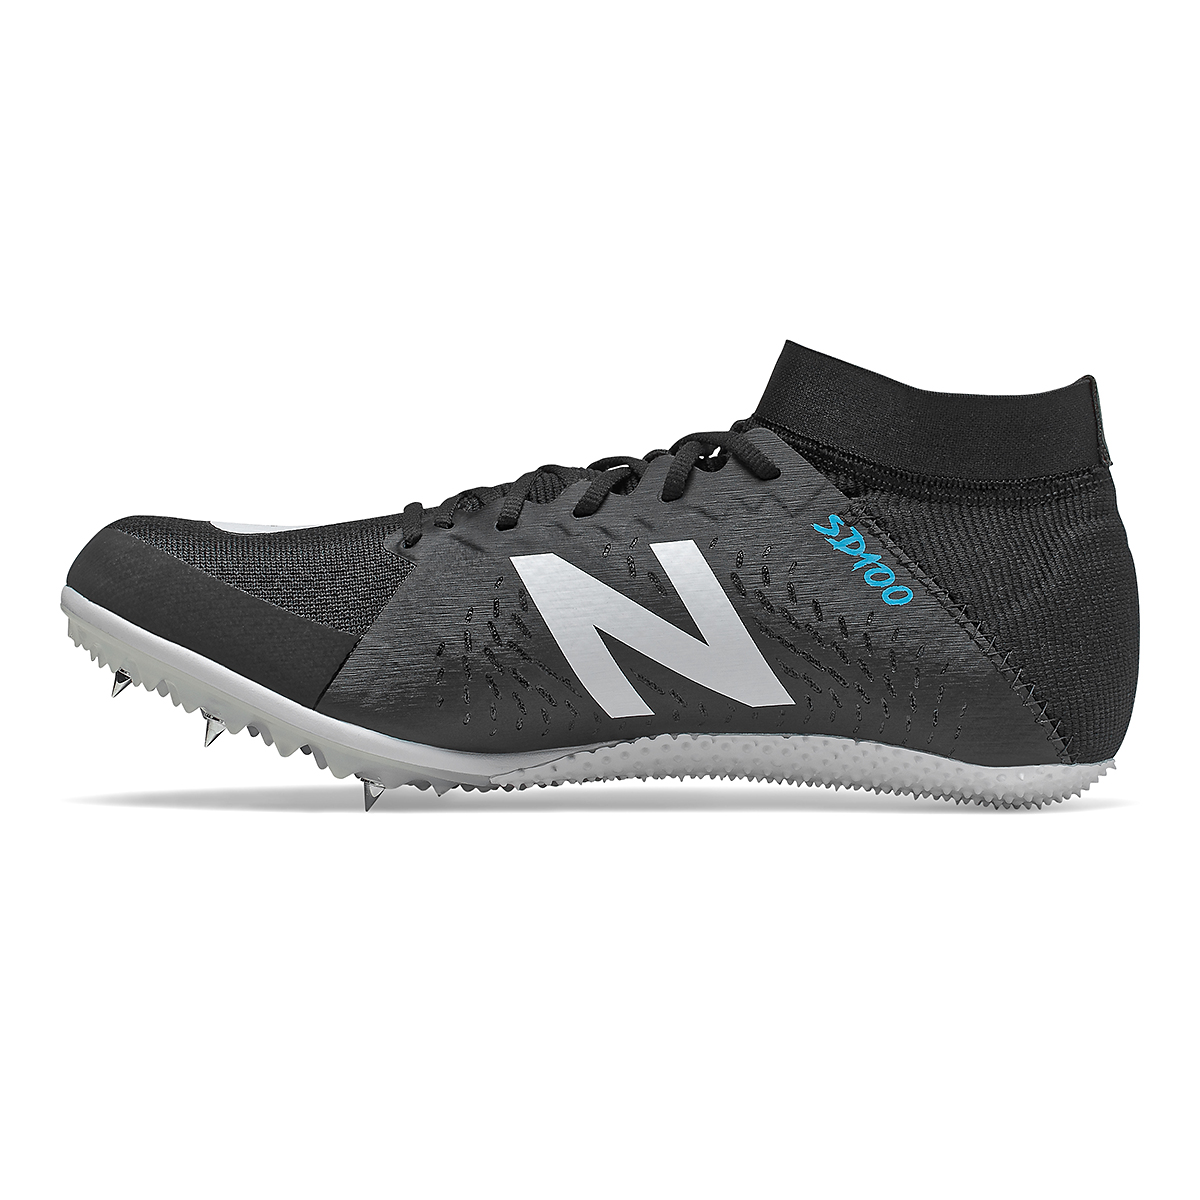 Women's New Balance SD100v3 Track Spikes - Color: Black/White - Size: 5.5 - Width: Regular, Black/White, large, image 2